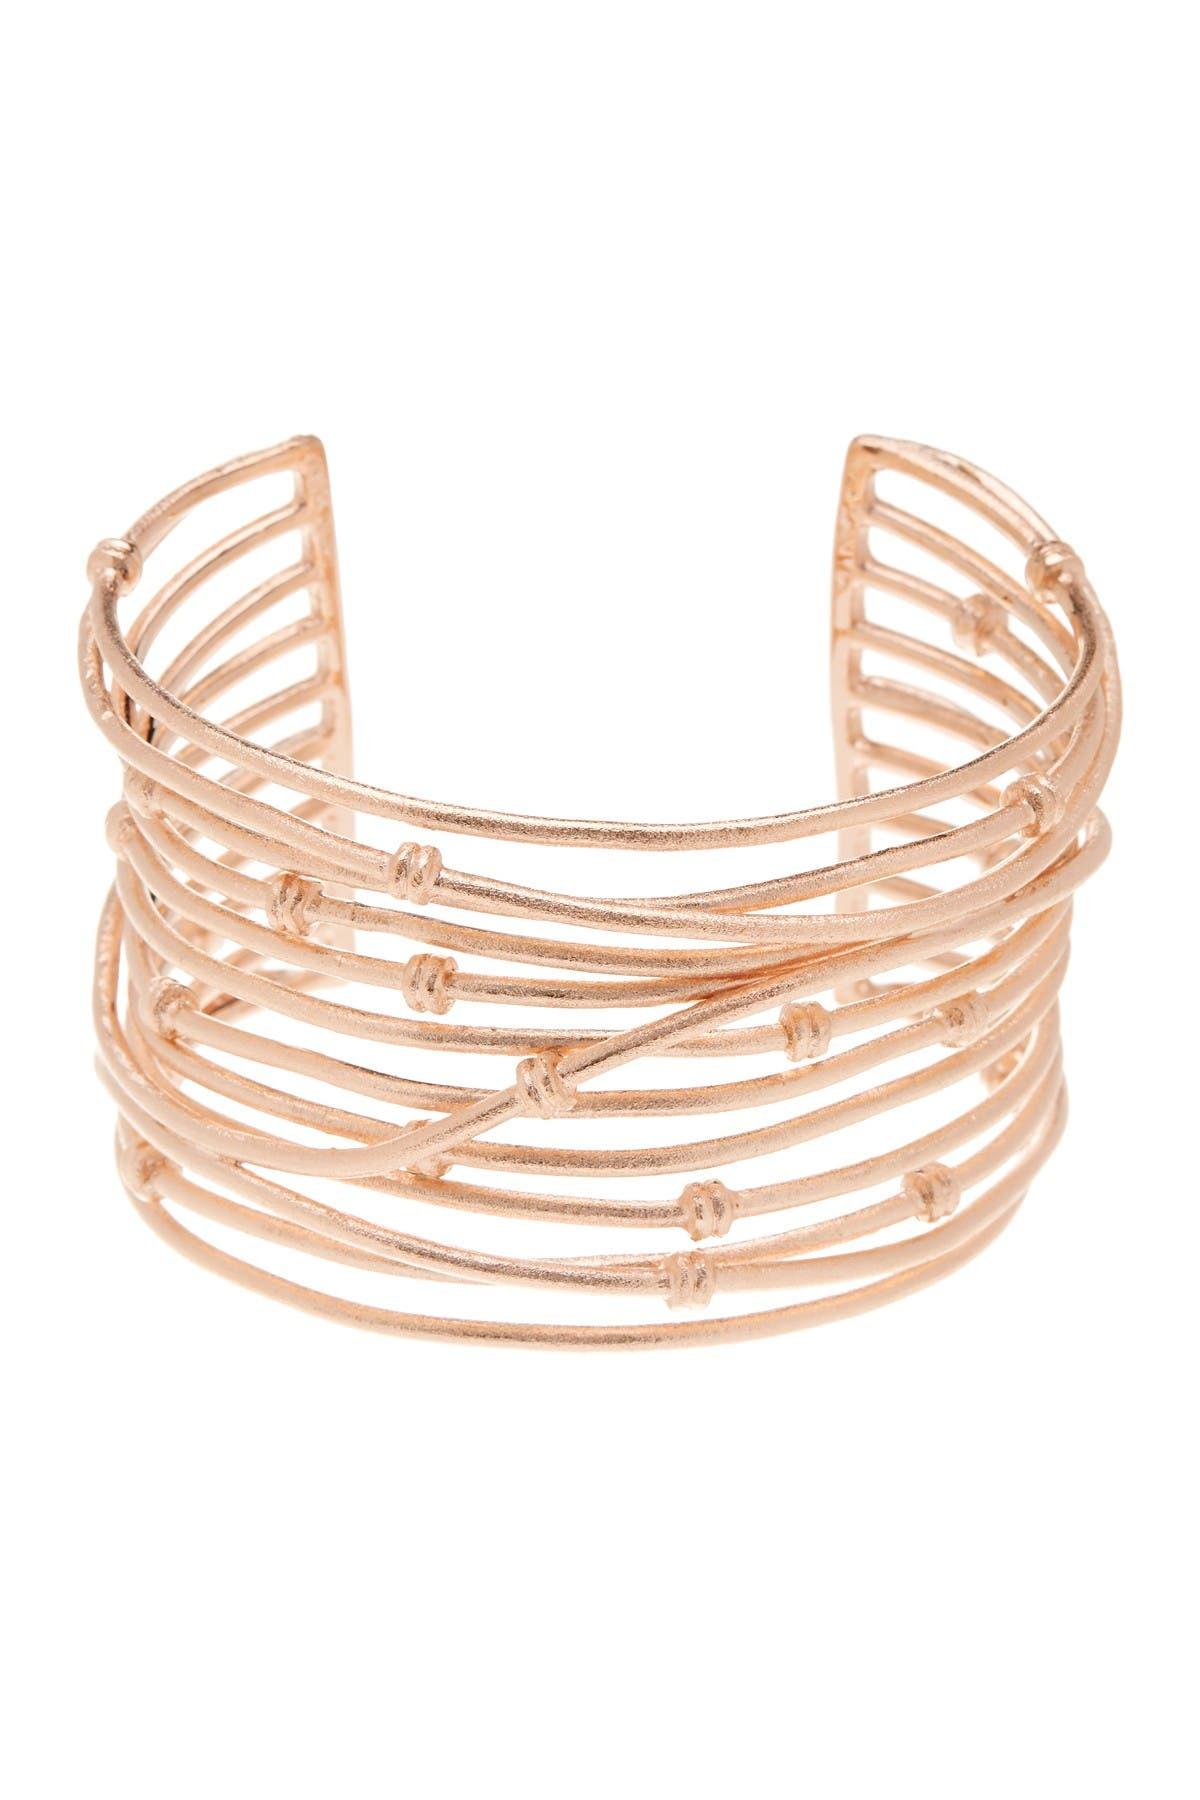 Image of Rivka Friedman 18K Rose Gold  Clad Bold Satin Mina Cuff Bracelet